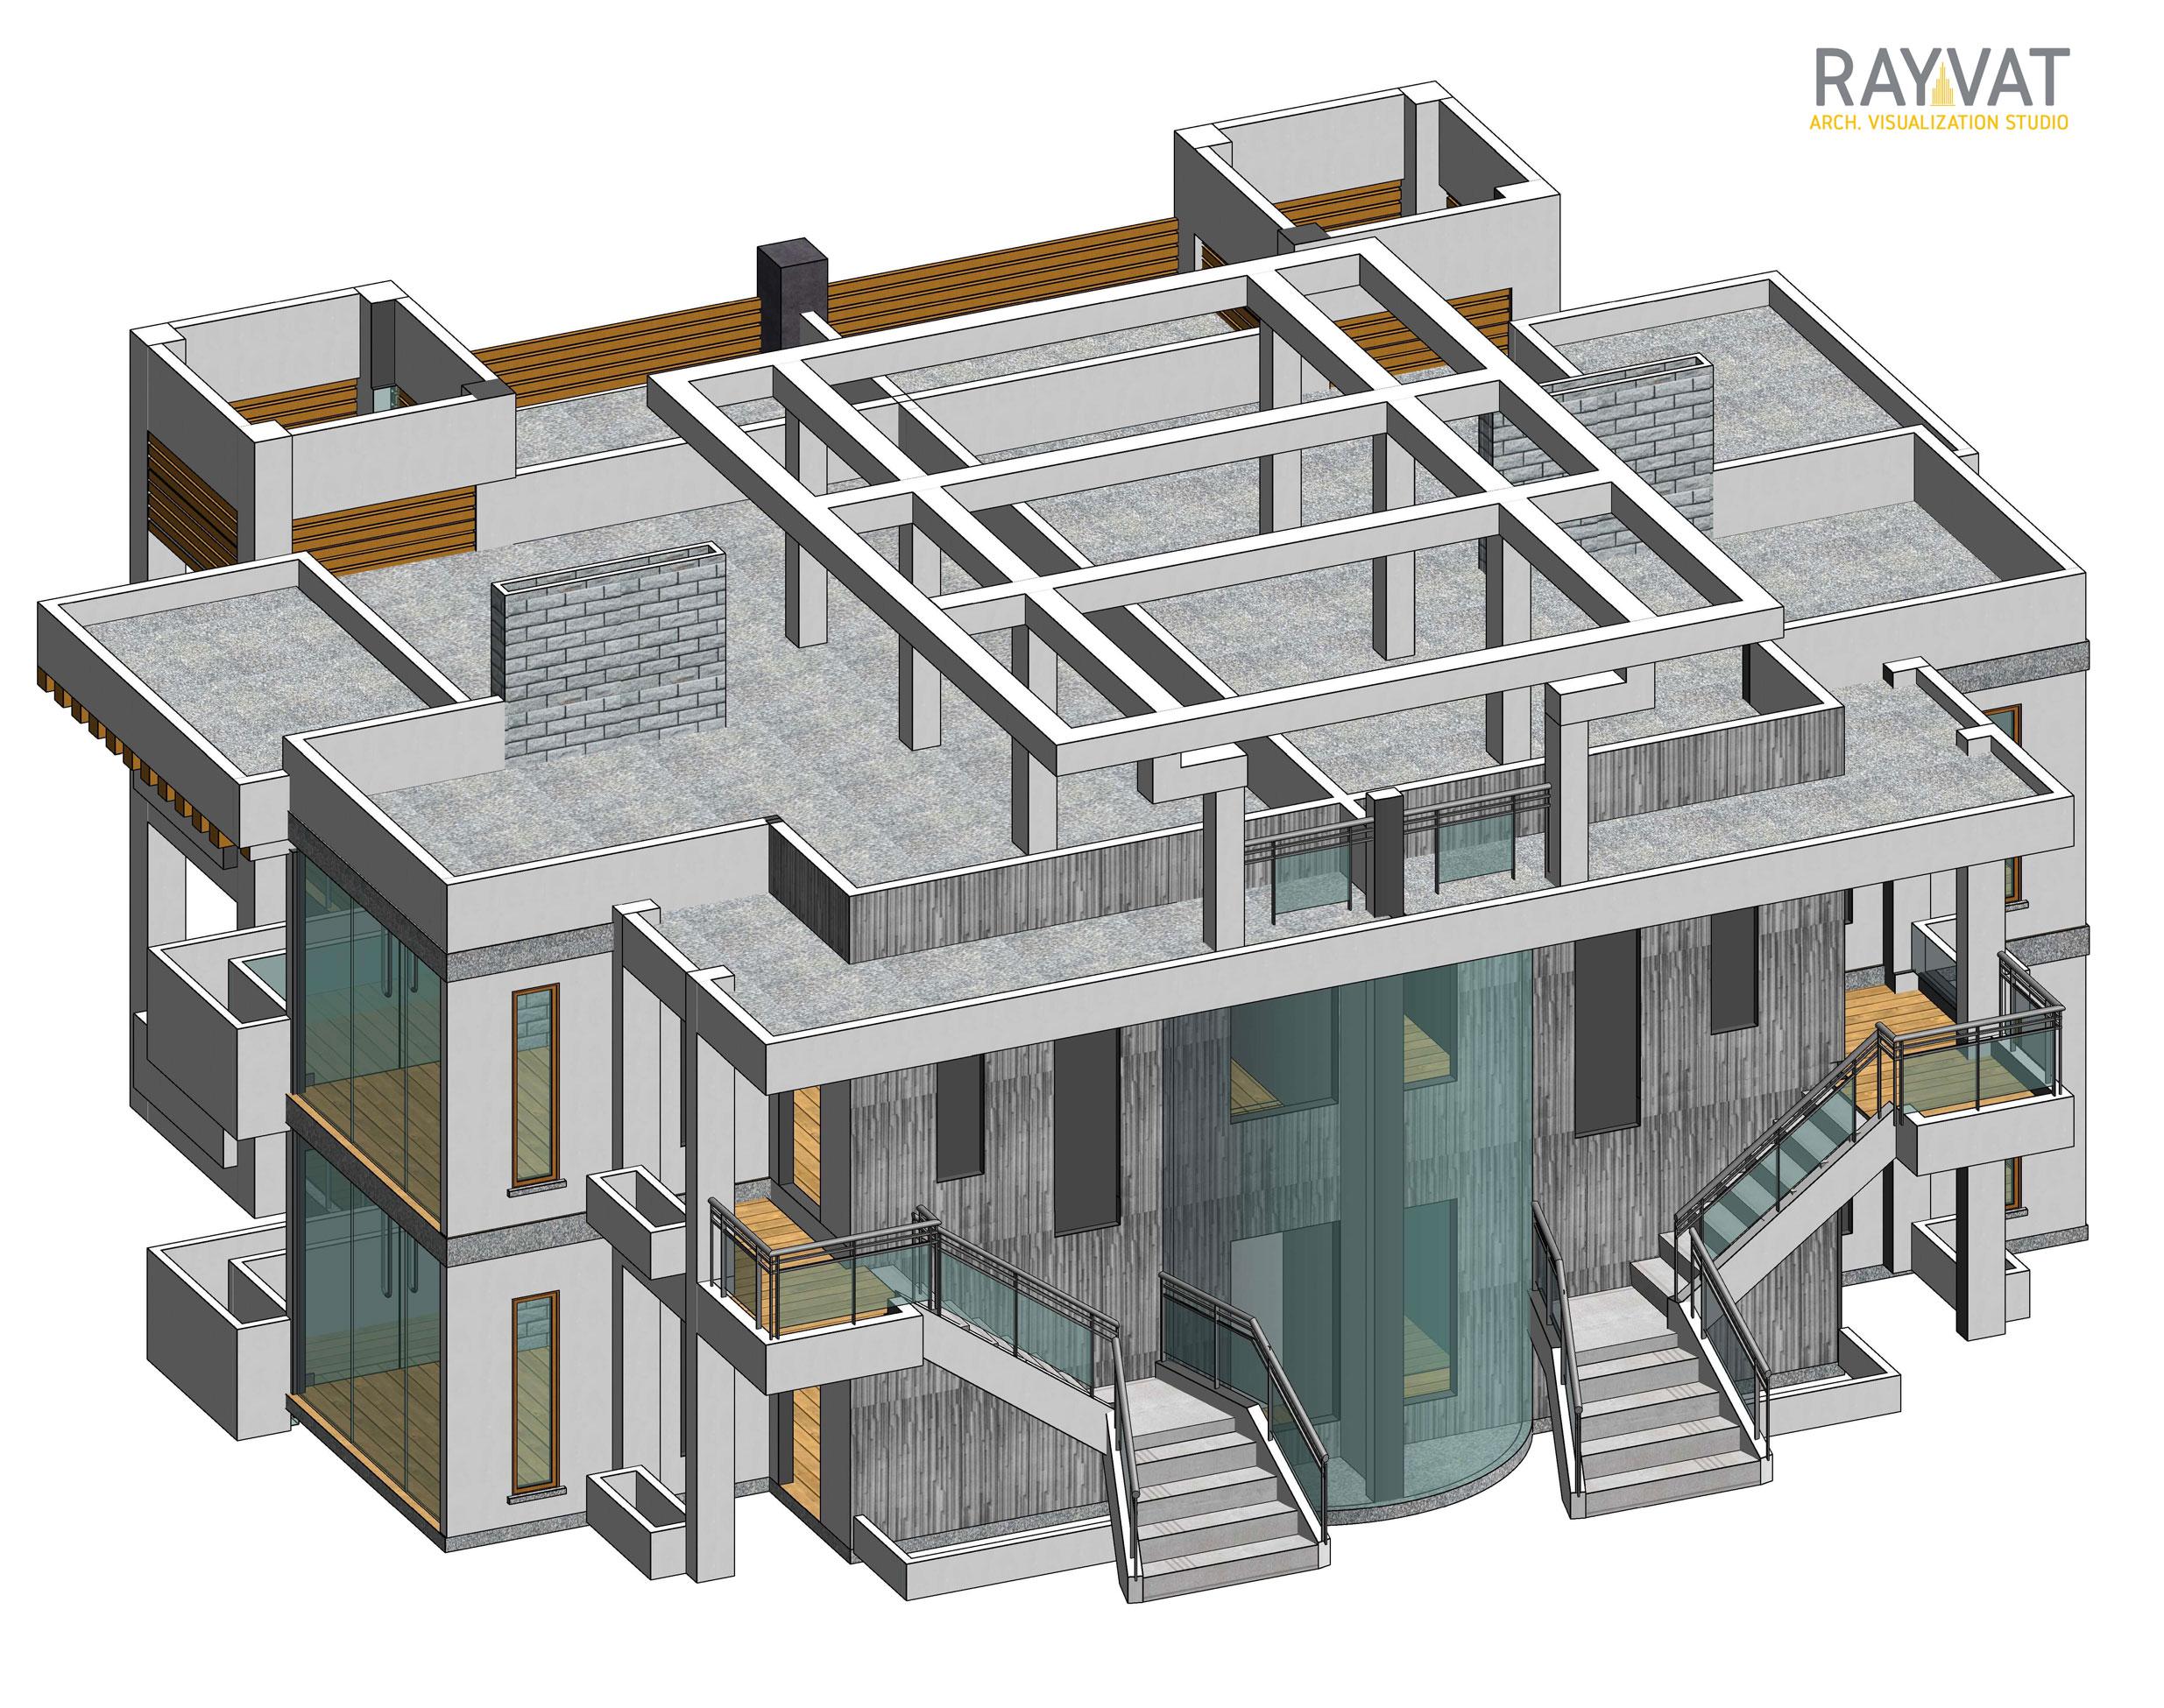 3D Modeling Construction